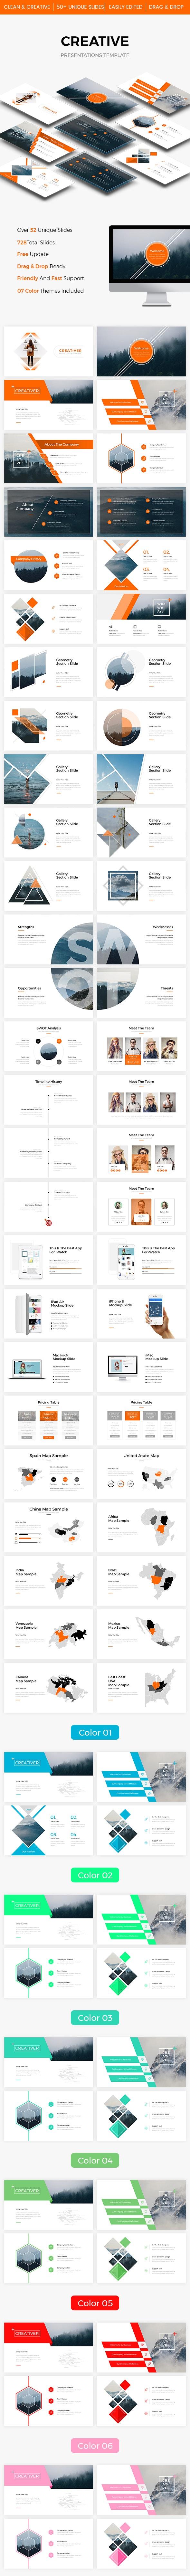 Bundle 3 in 1 Creative Powerpoint Template - Creative PowerPoint Templates